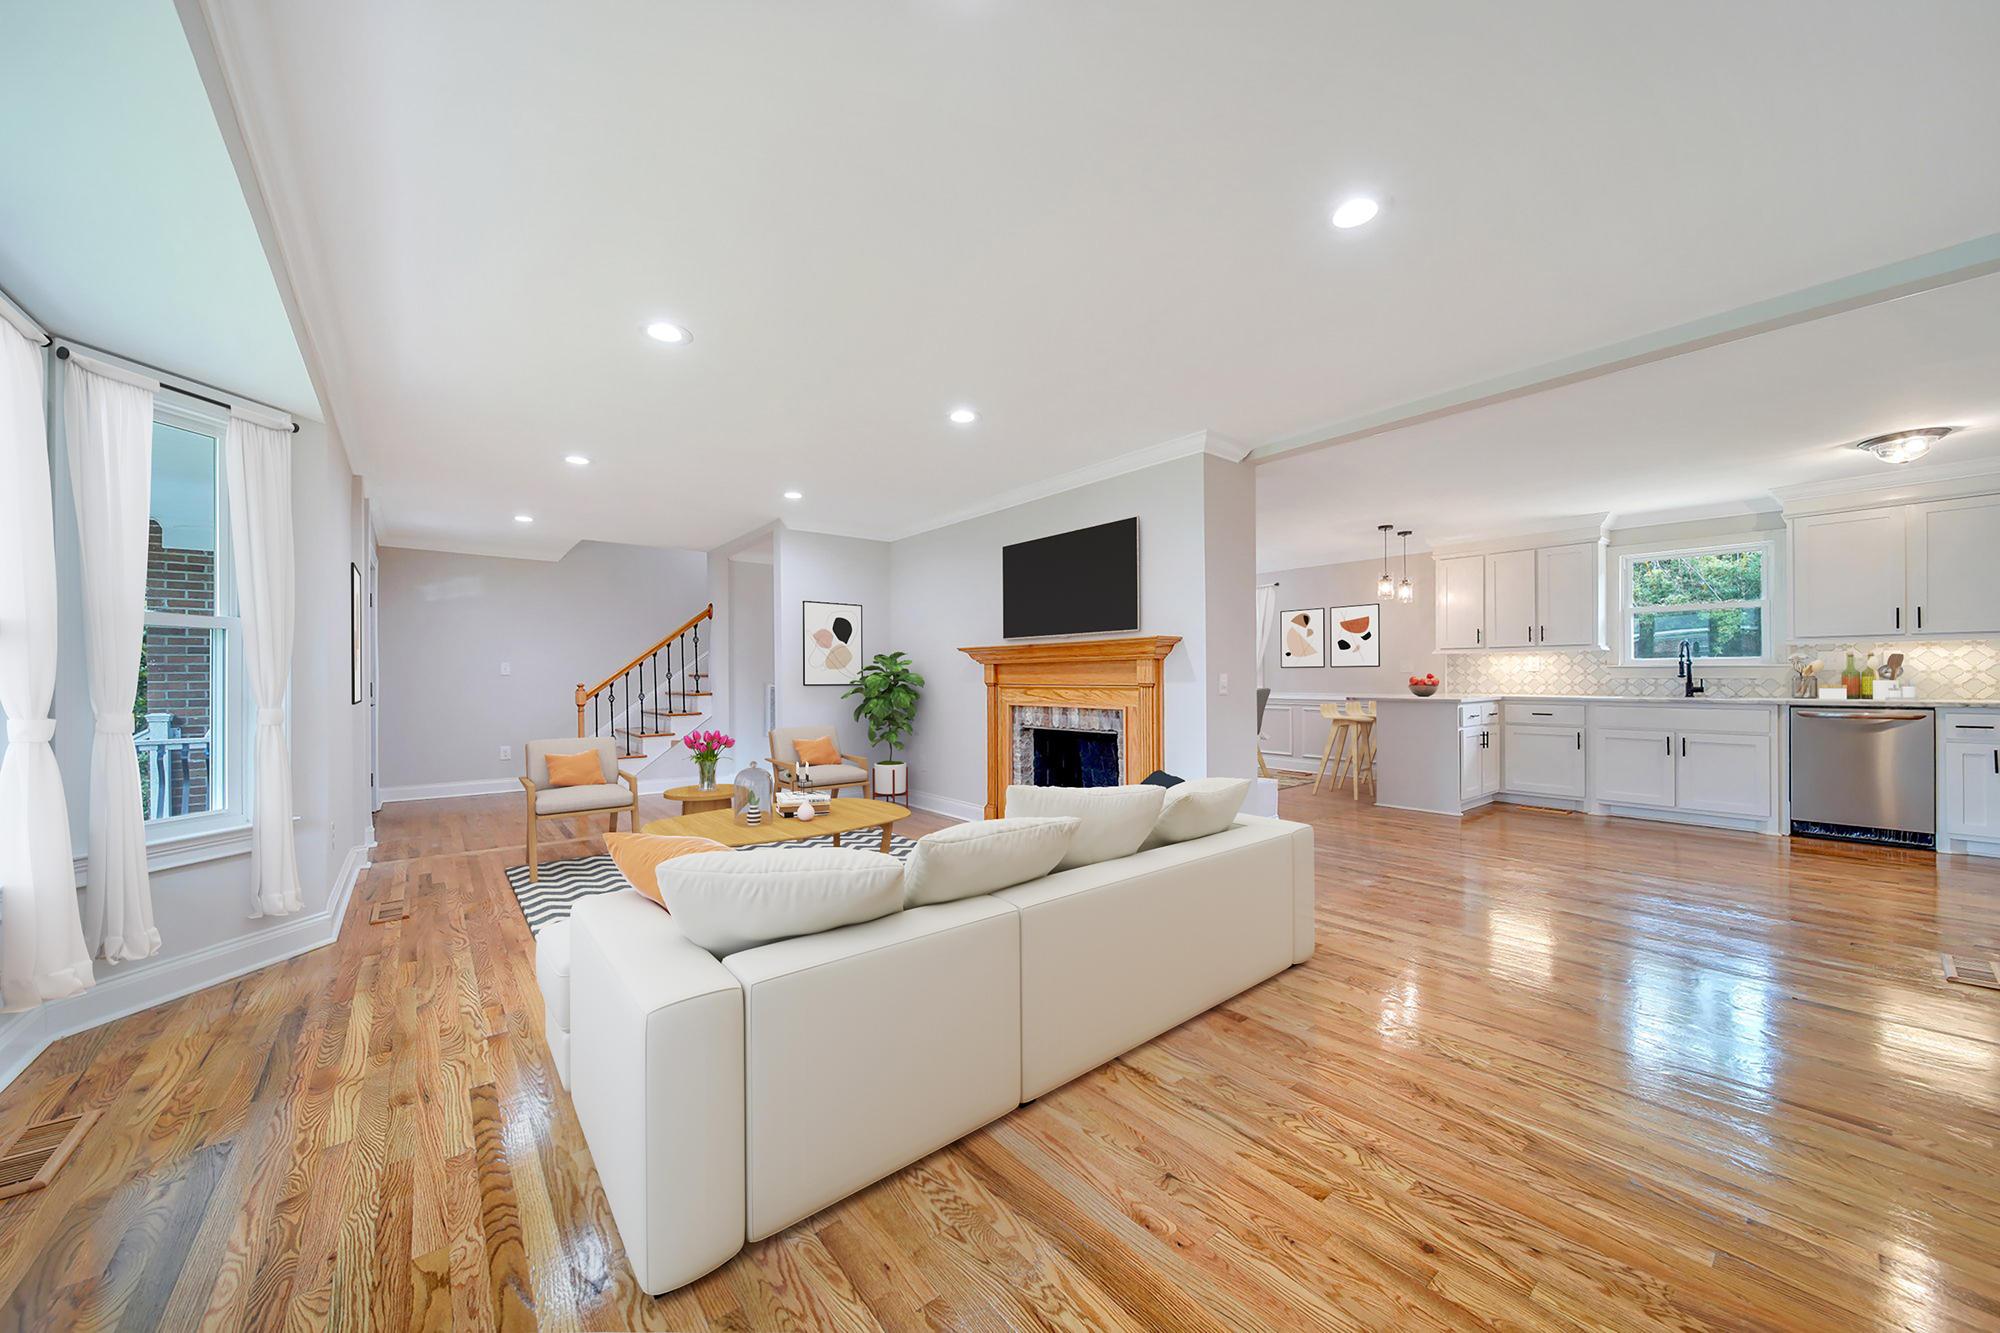 Country Club II Homes For Sale - 1477 Burningtree, Charleston, SC - 27